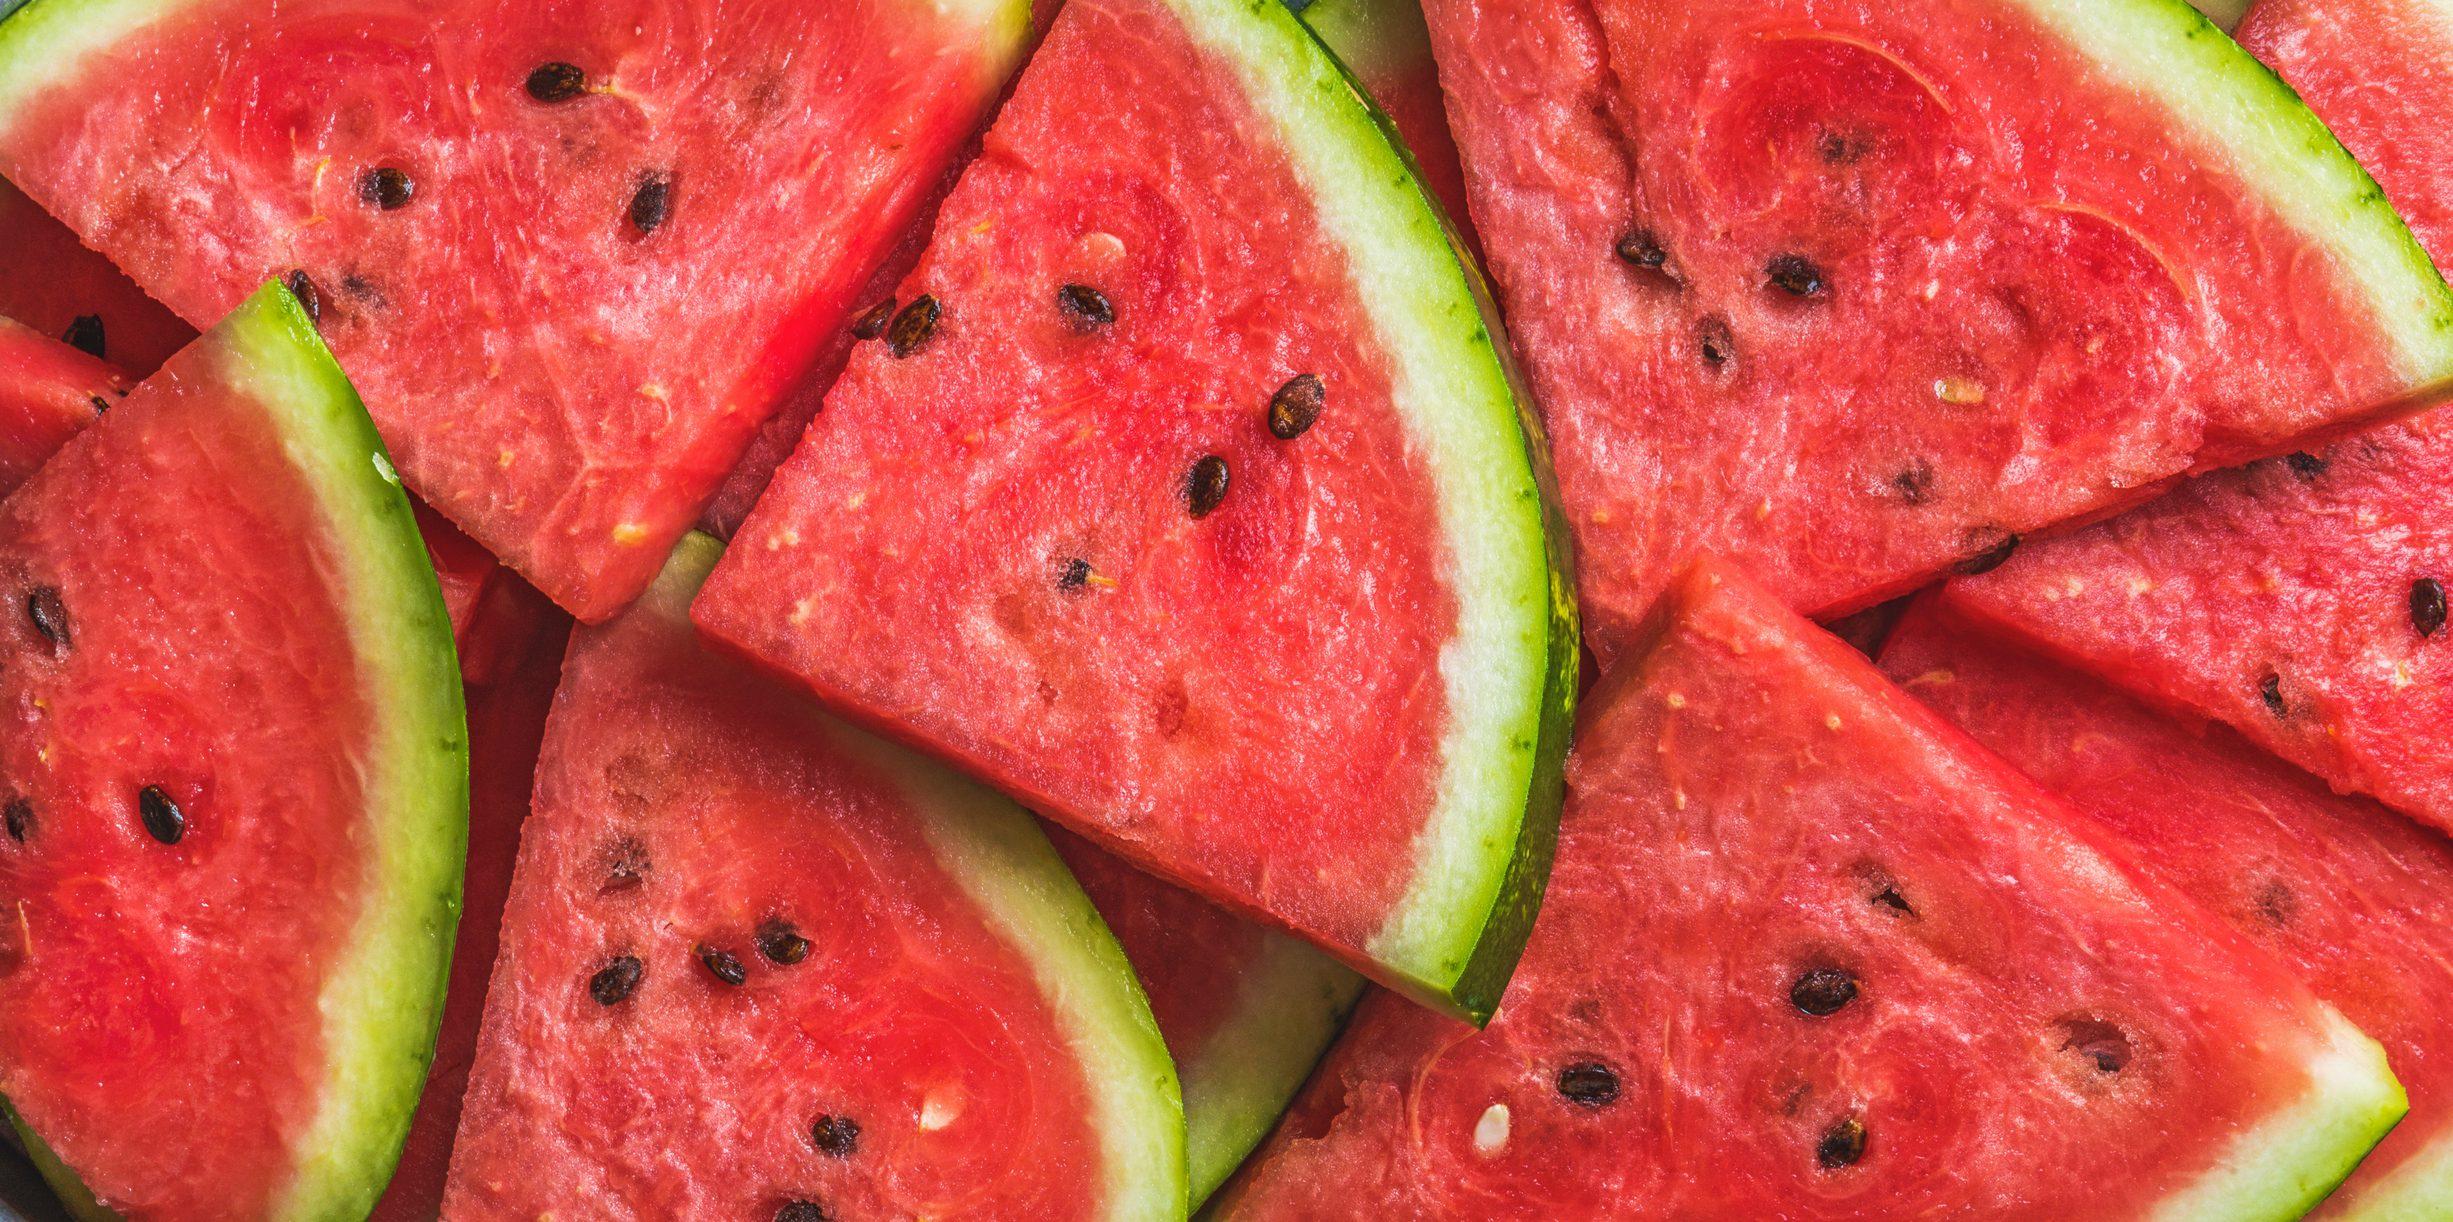 watermelon-seeds